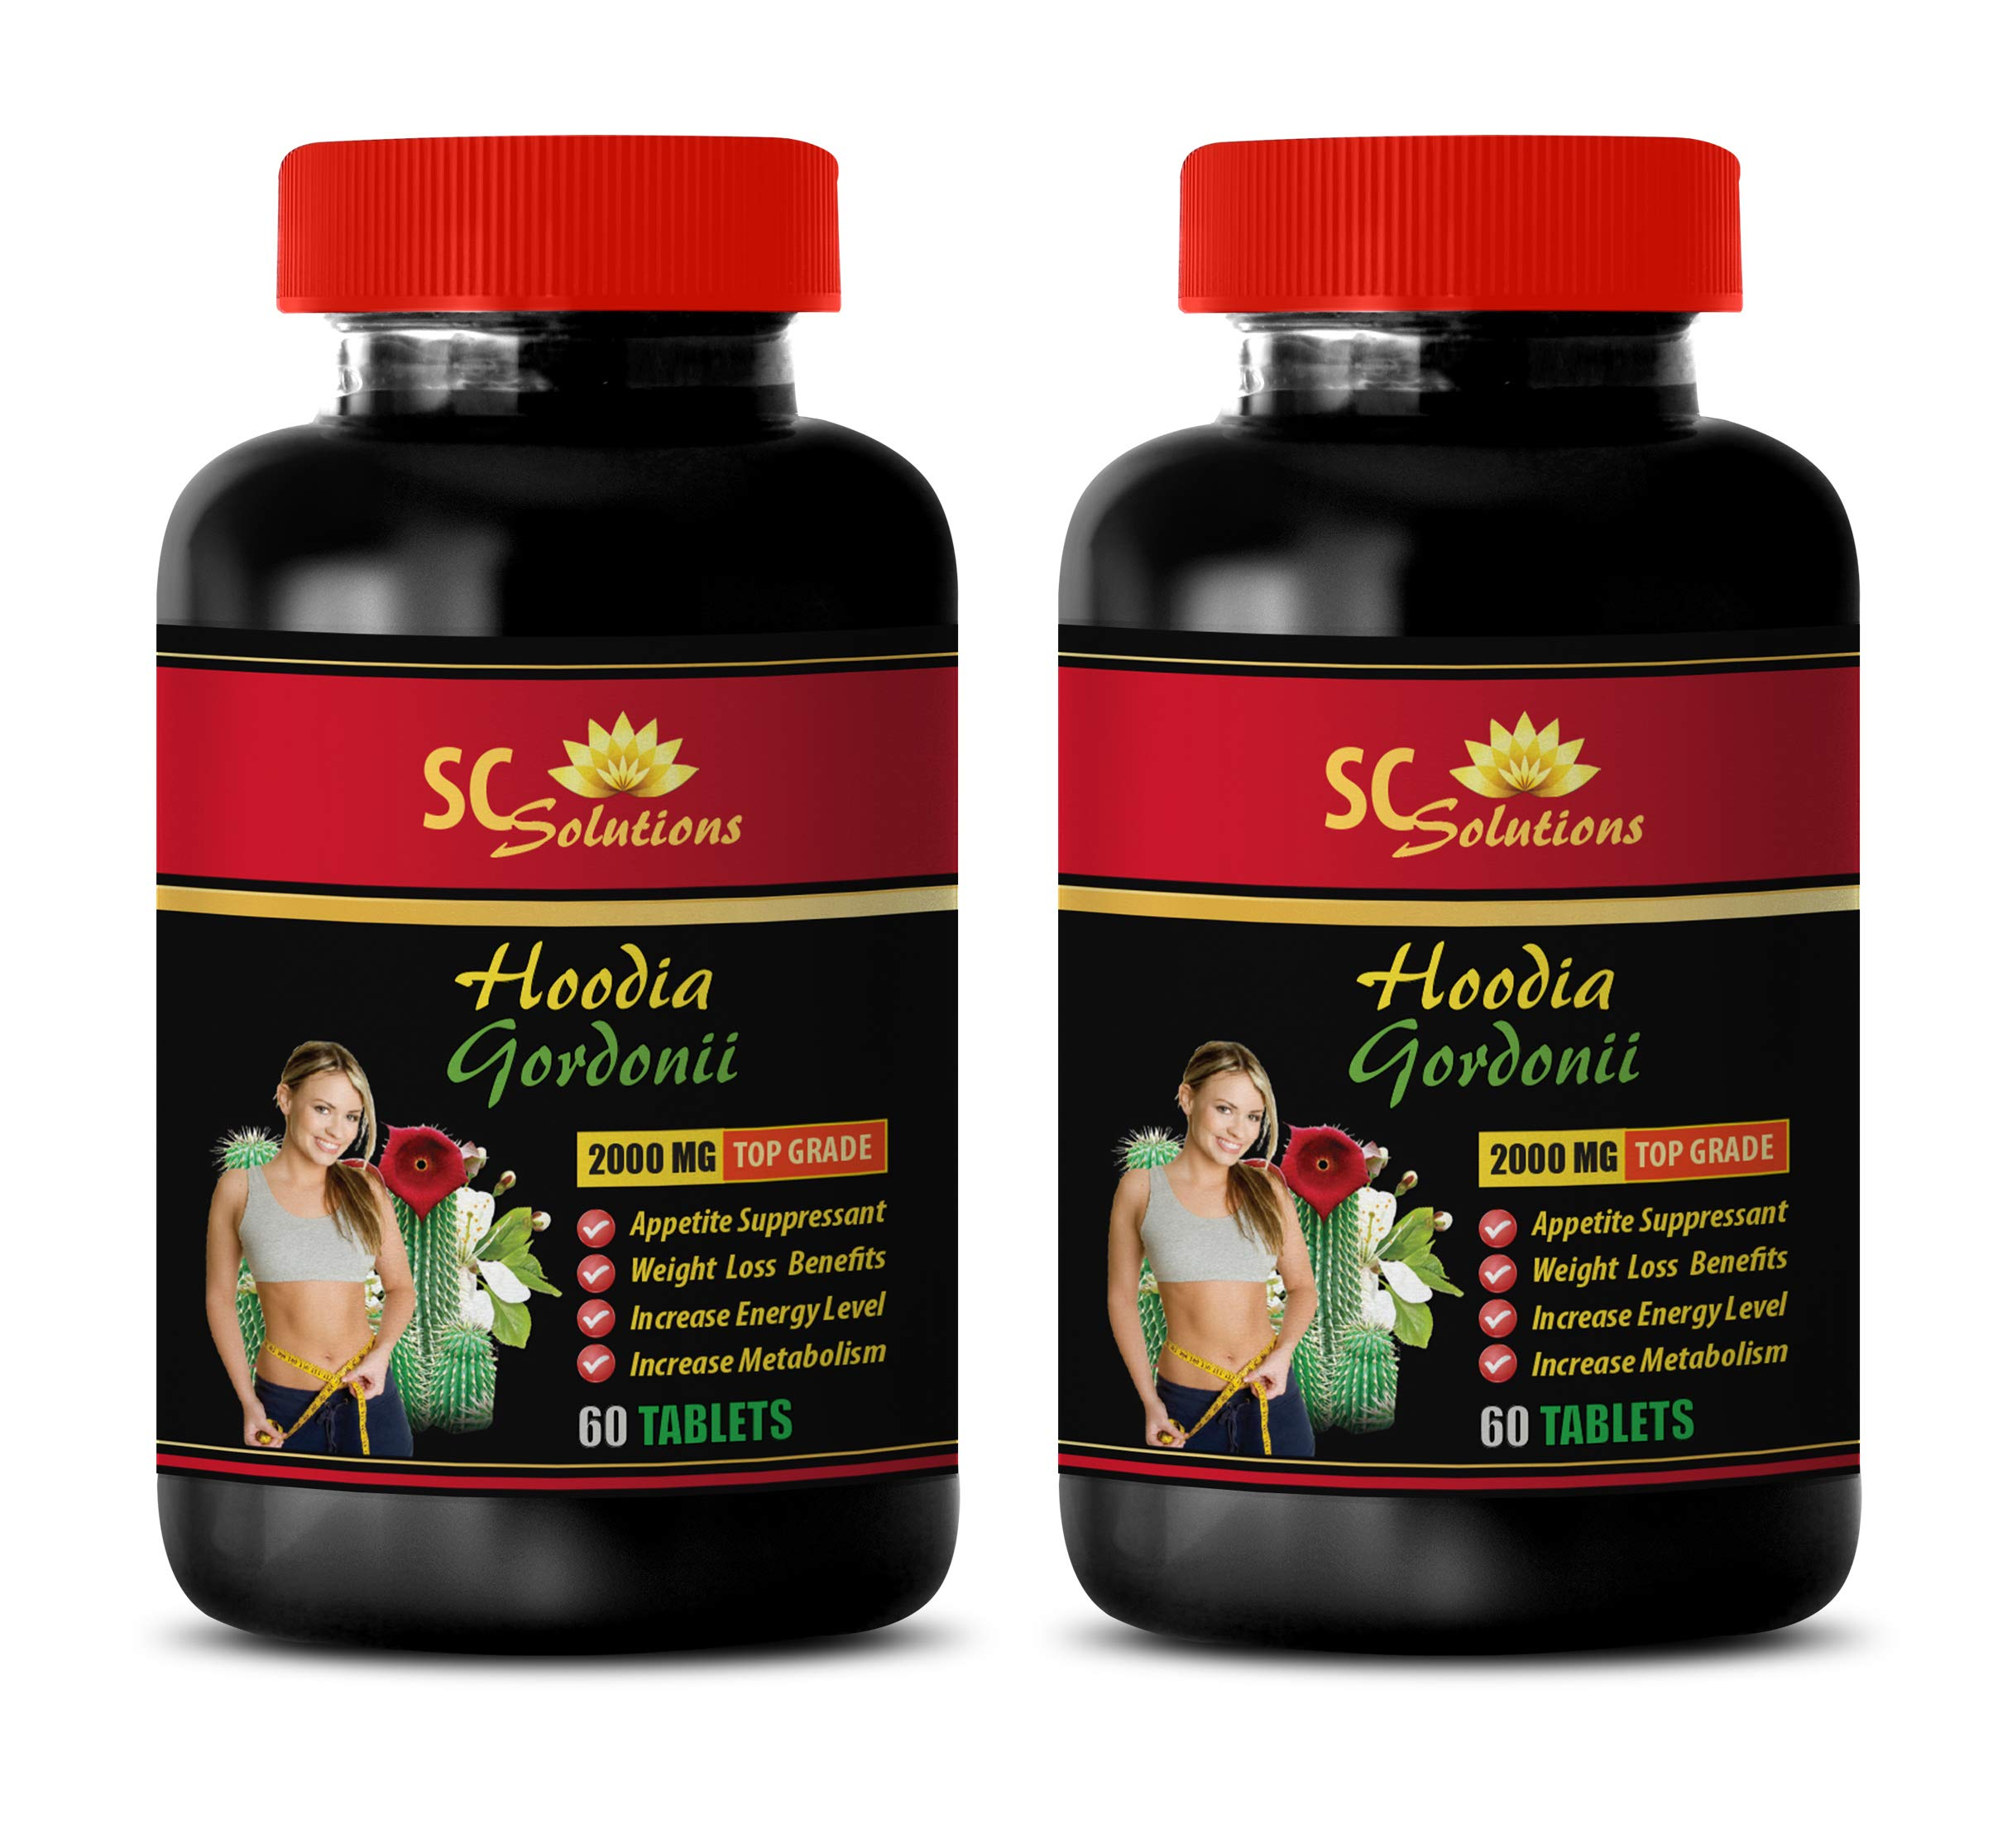 Appetite Suppressant with Energy - HOODIA GORDONII 2000MG - Hoodia Pills - 2 Bottle (120 Tablets)